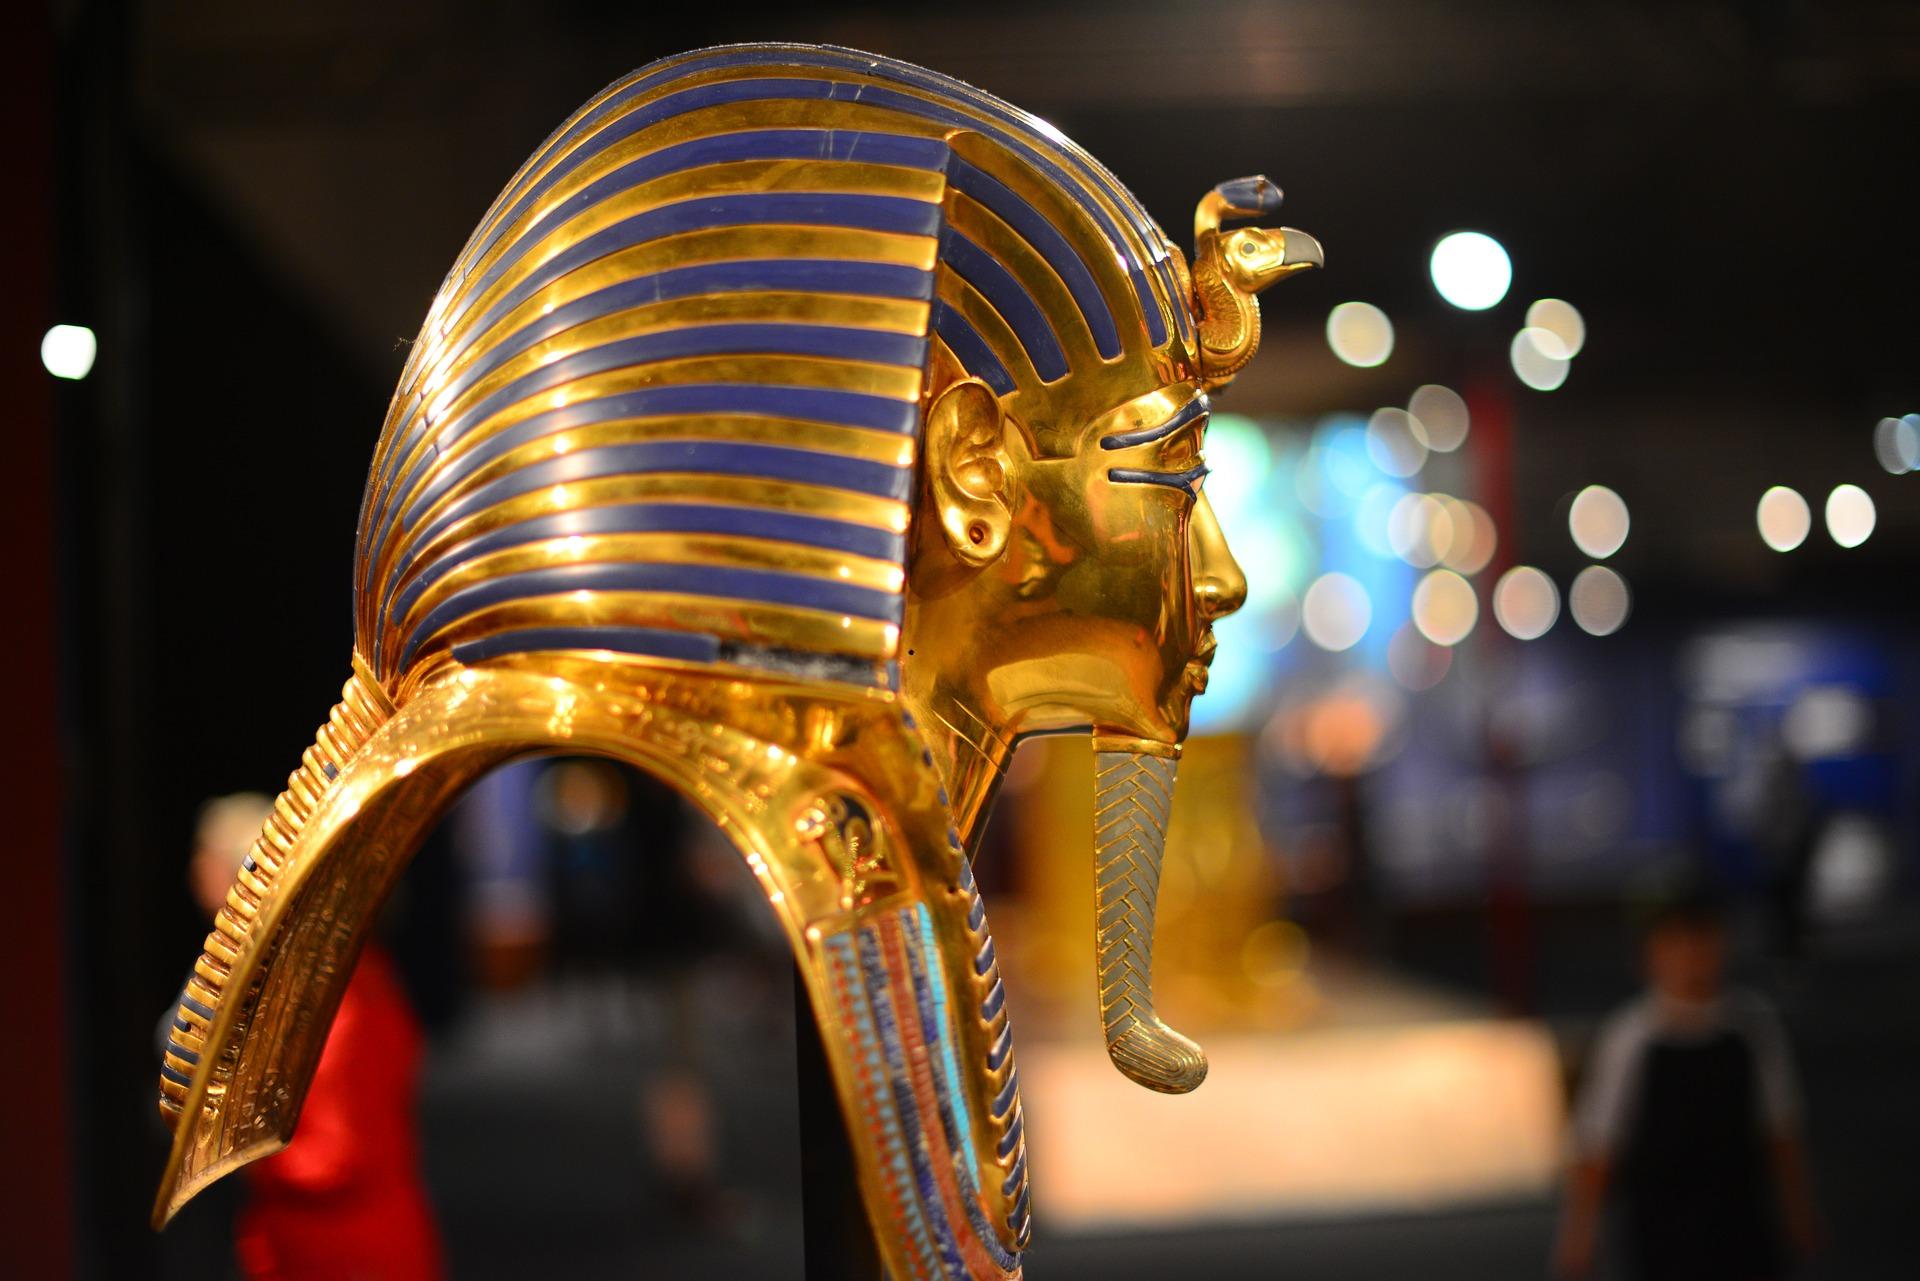 Information About King Tutankhamun | Ancient Egypt | Egypt Tours Portal